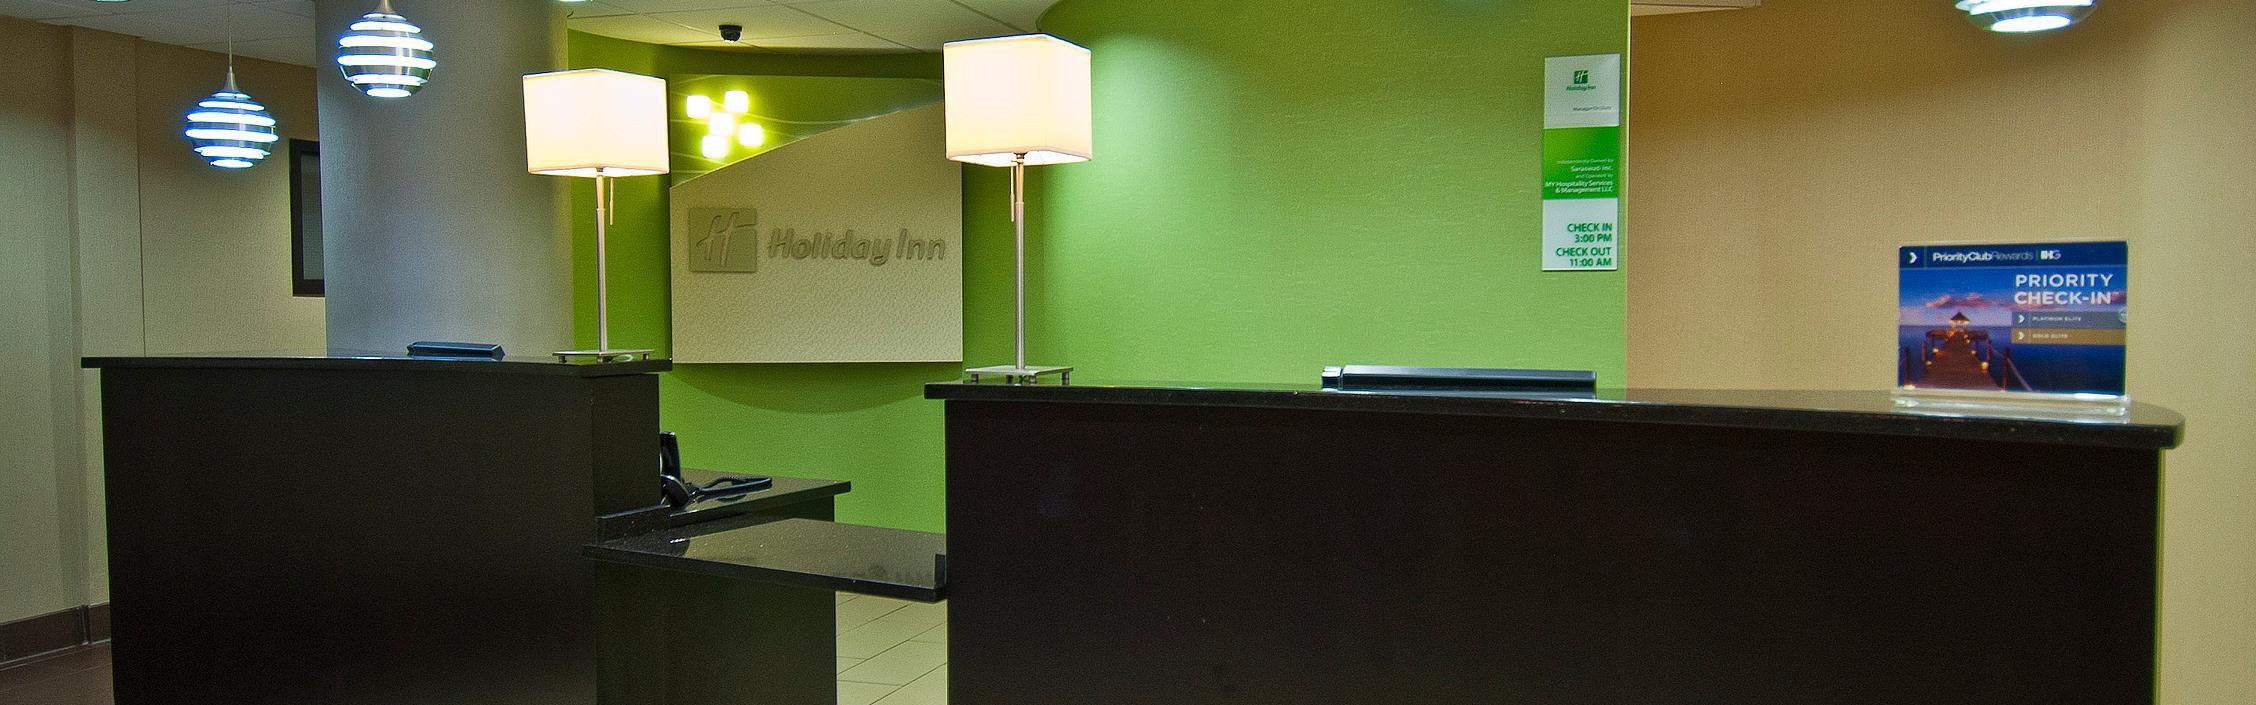 holiday inn vicksburg hotel by ihg rh ihg com holiday inn vicksburg ms events holiday inn vicksburg manager